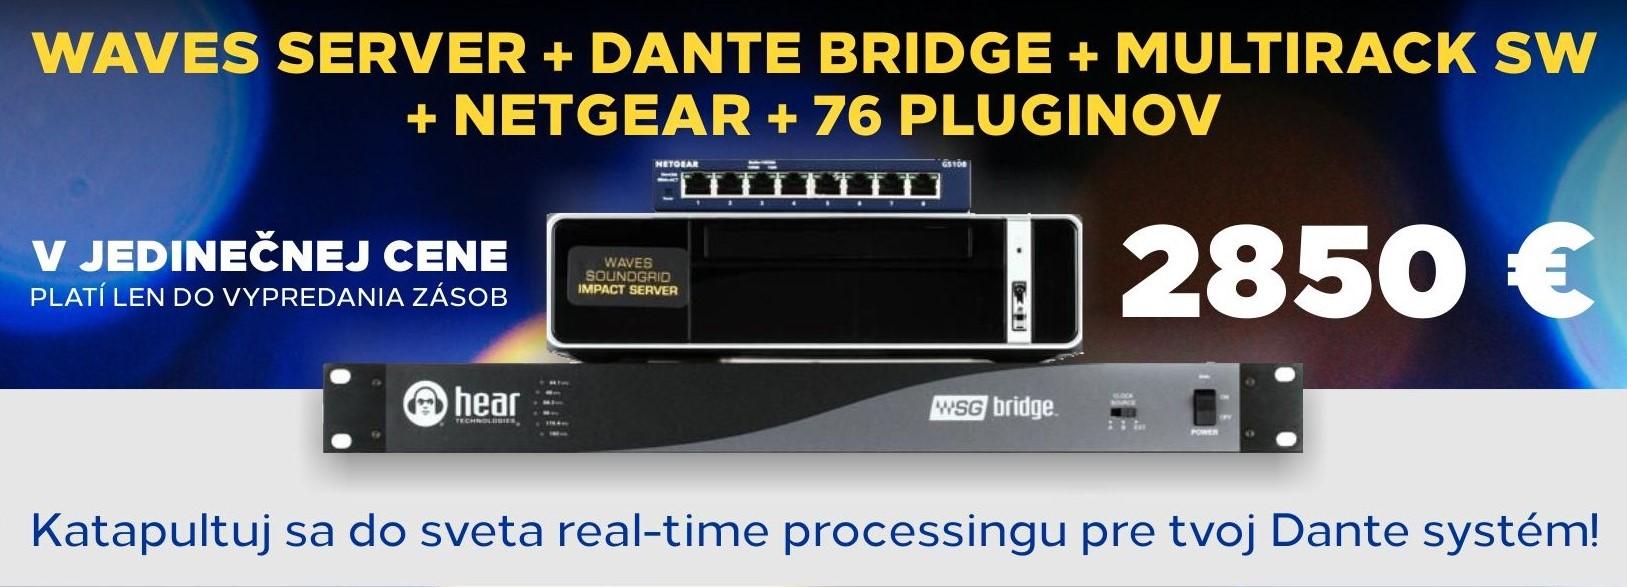 Waves server + Dante bridge + MultiRack SW + Netgear + 76 pluginov